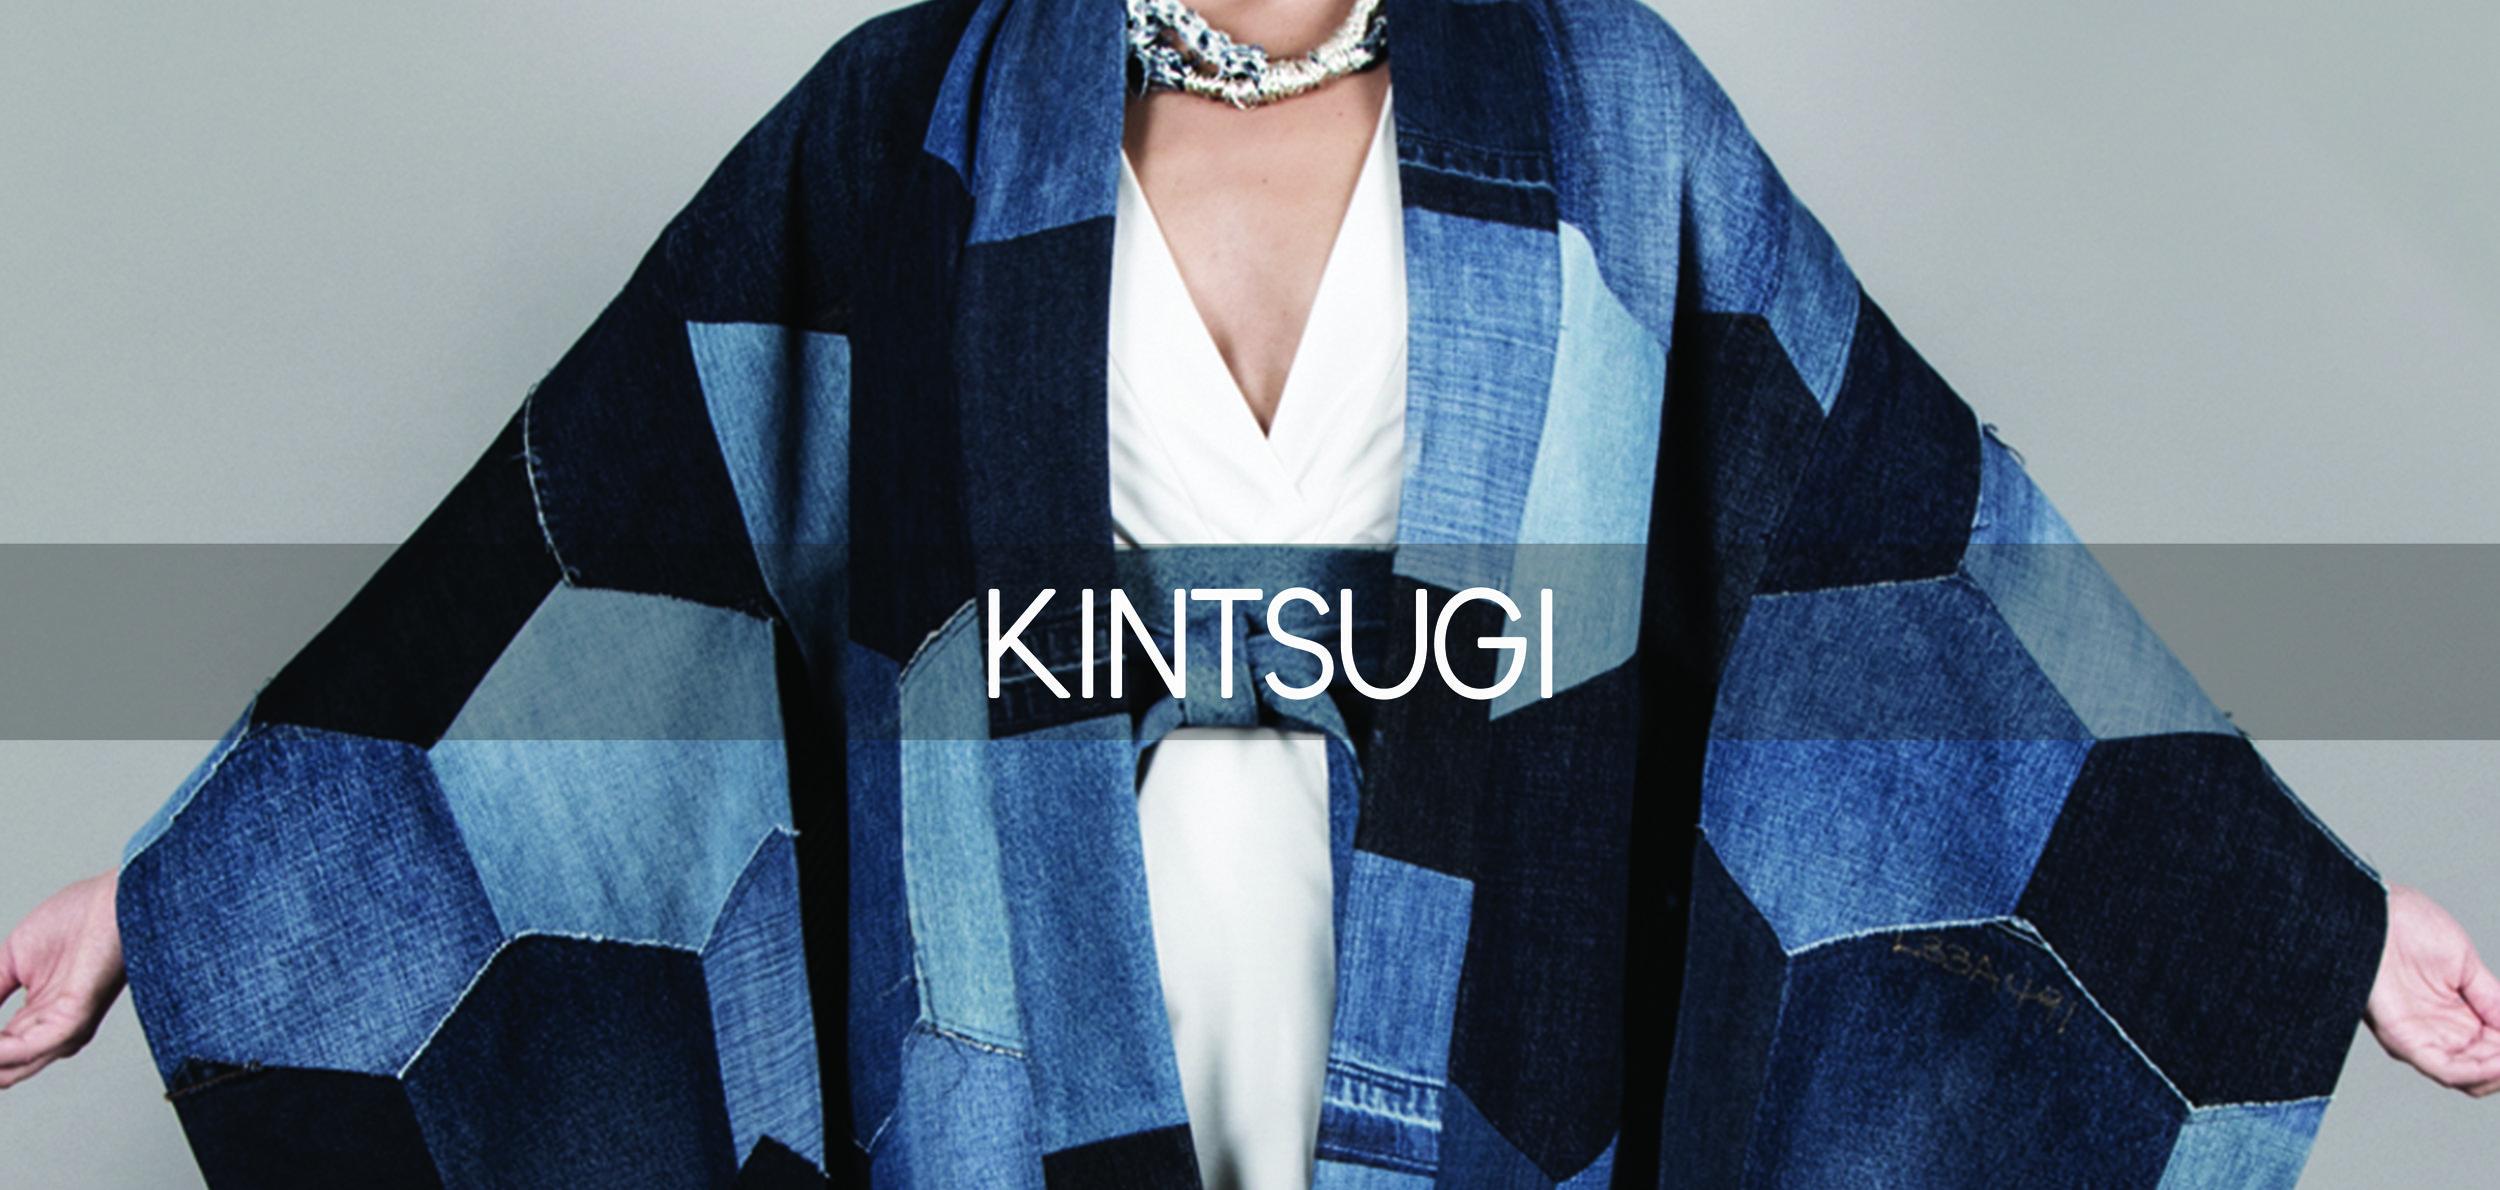 KINTSUGI HEADER 3.jpg